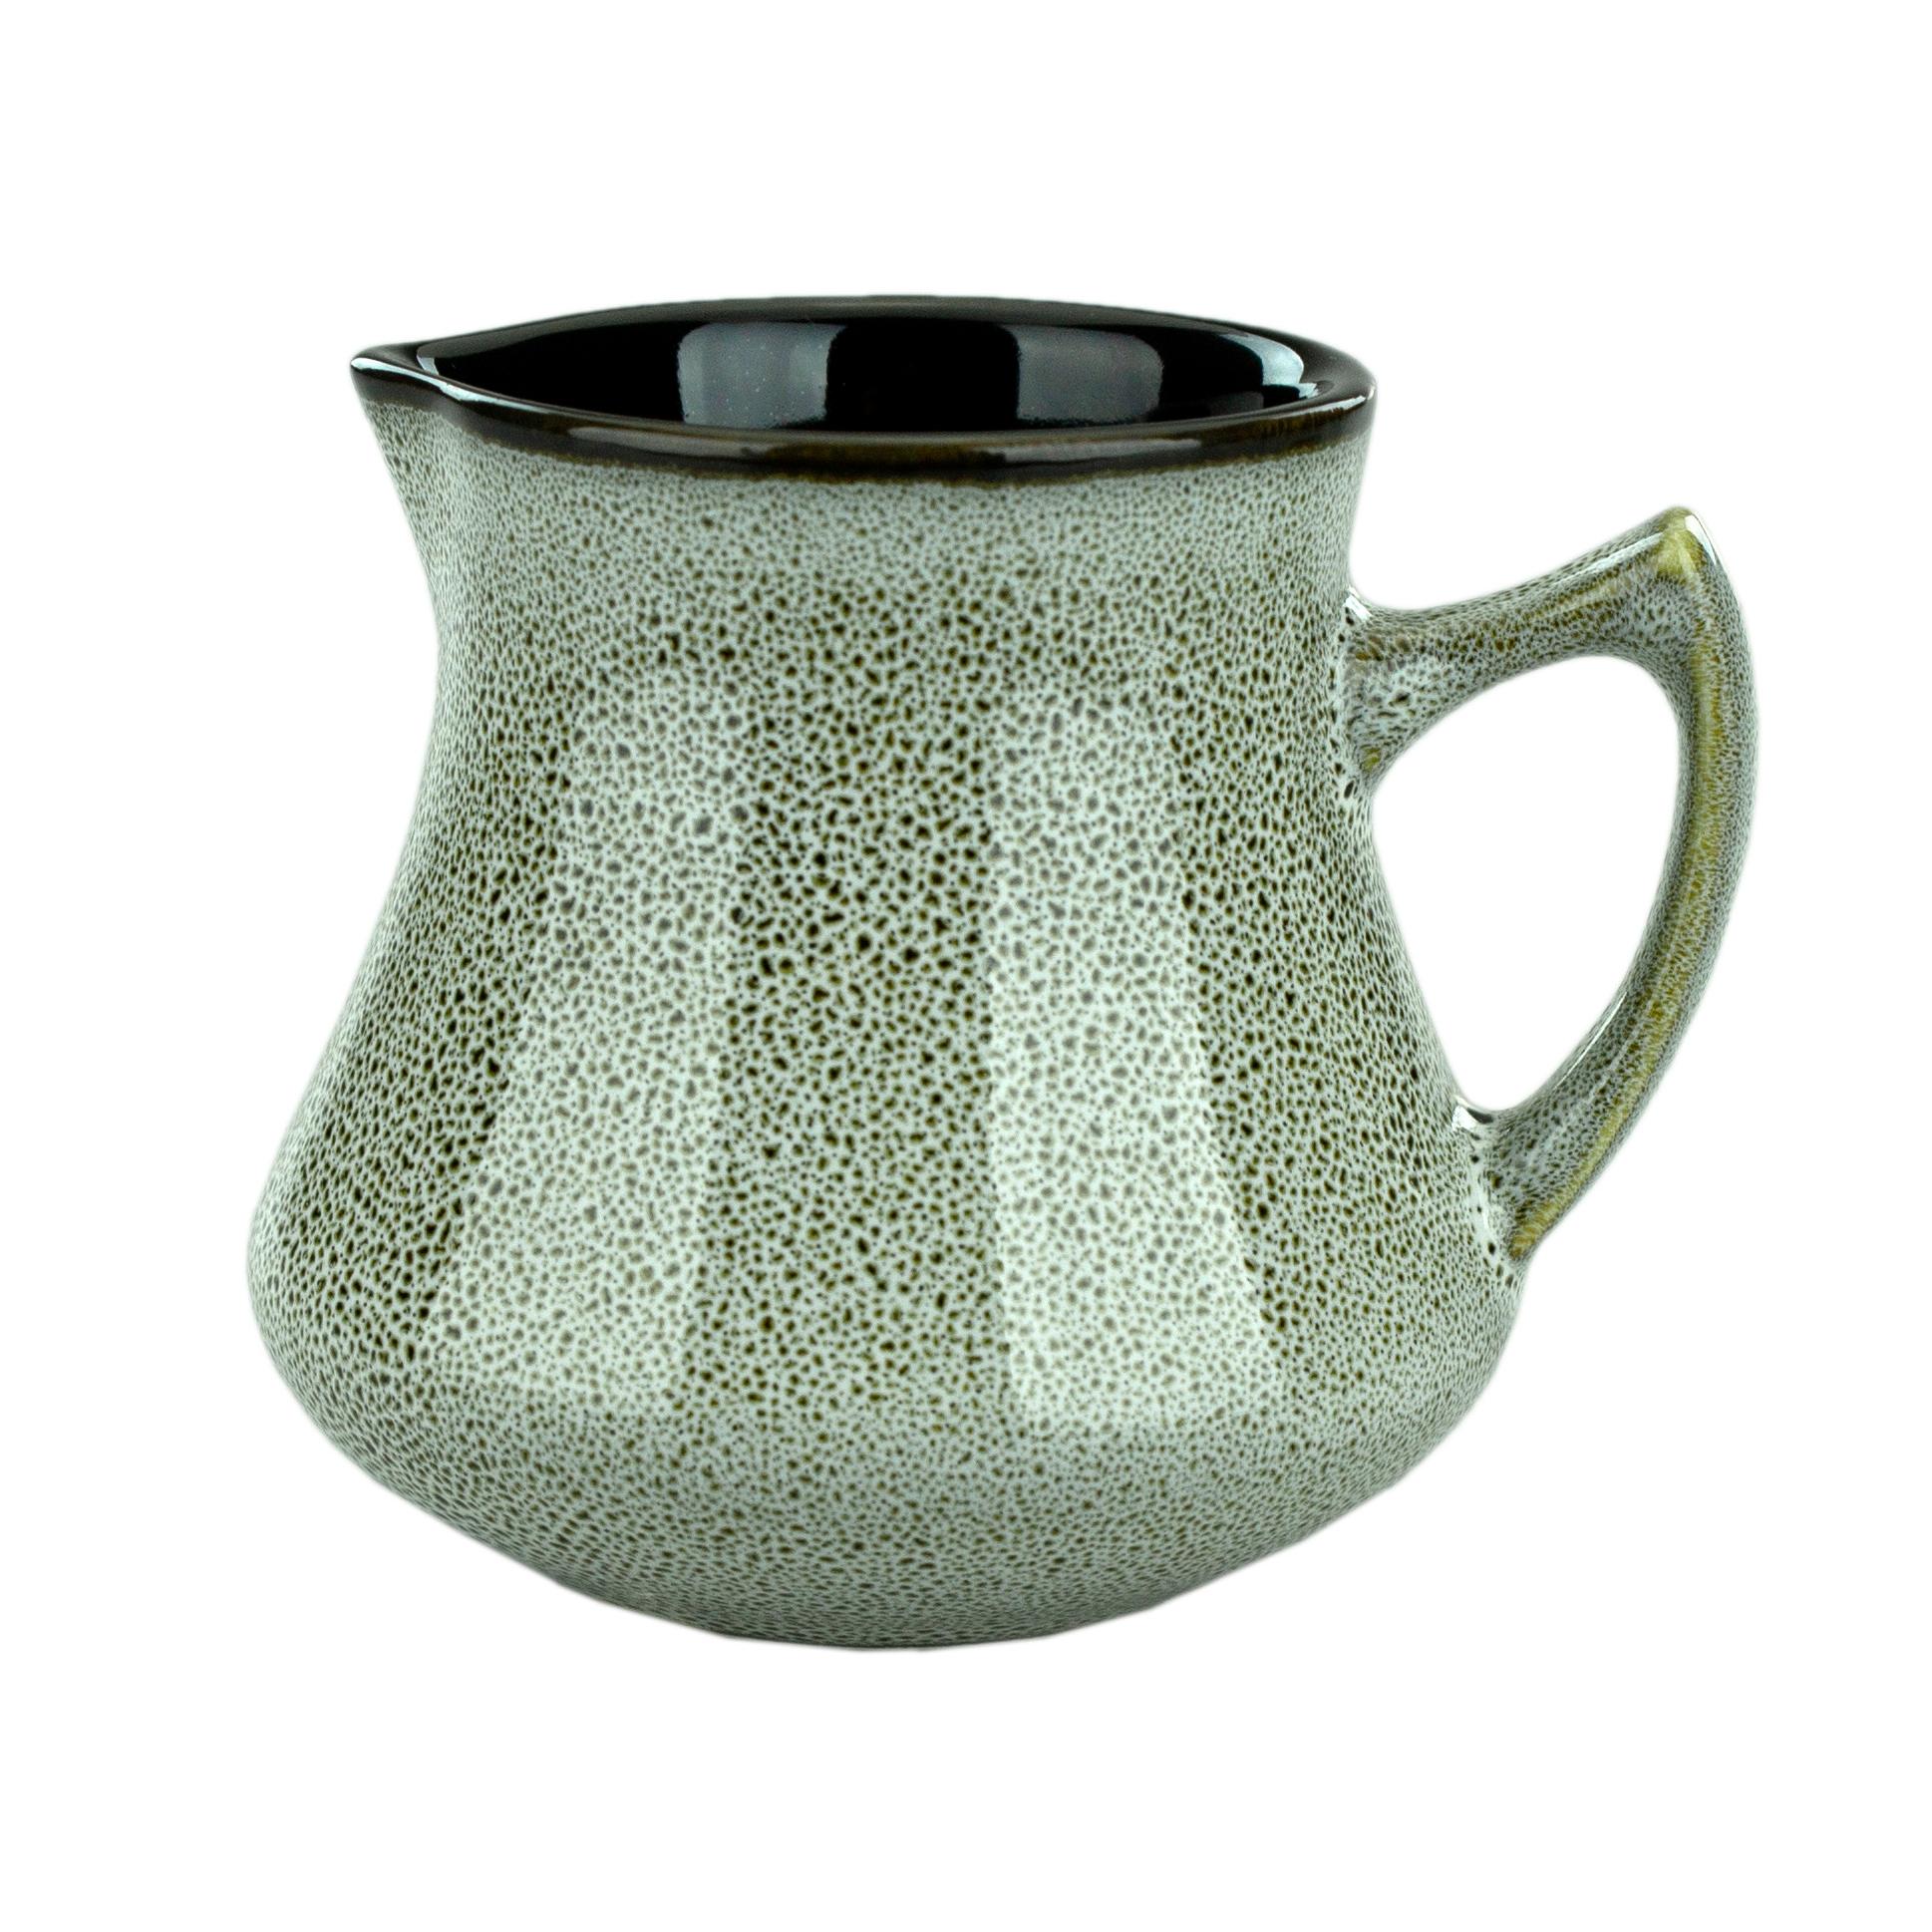 International Tableware LU-40-AS creamer / pitcher, china